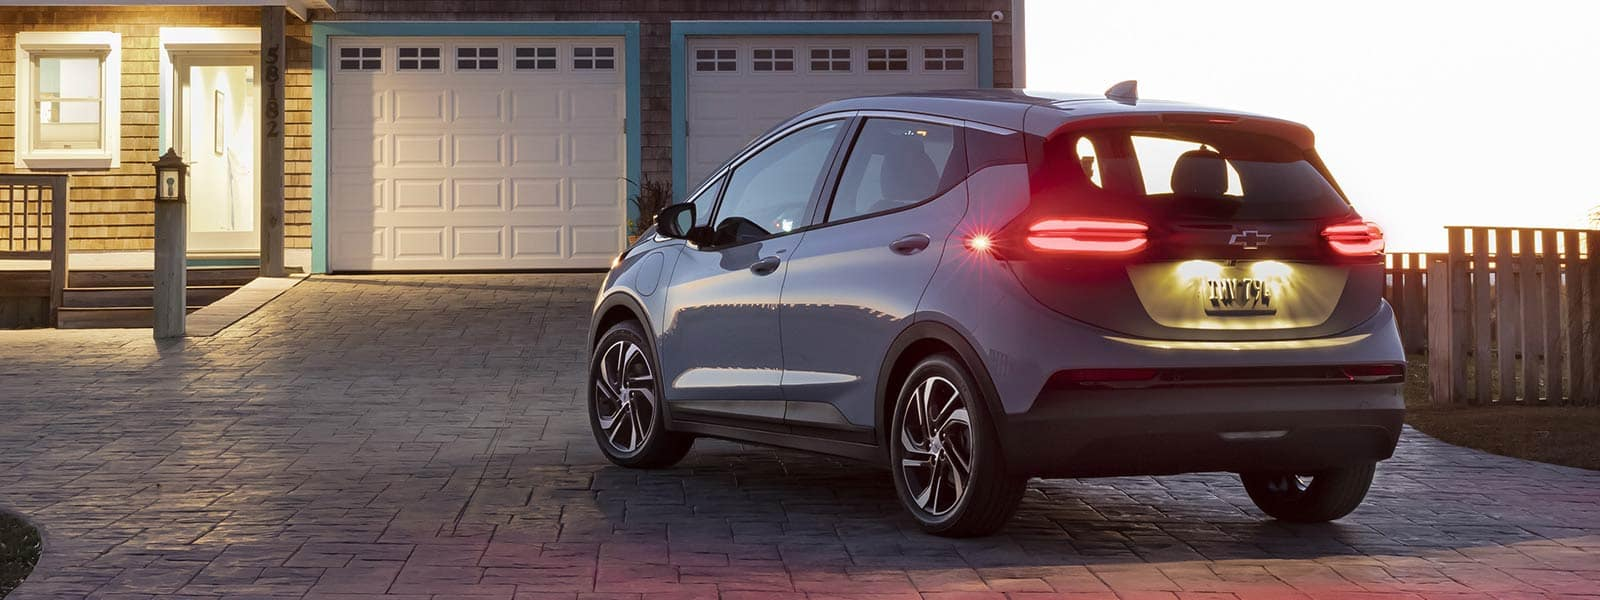 Lease or finance new 2022 Chevrolet Bolt EV in Regina SK